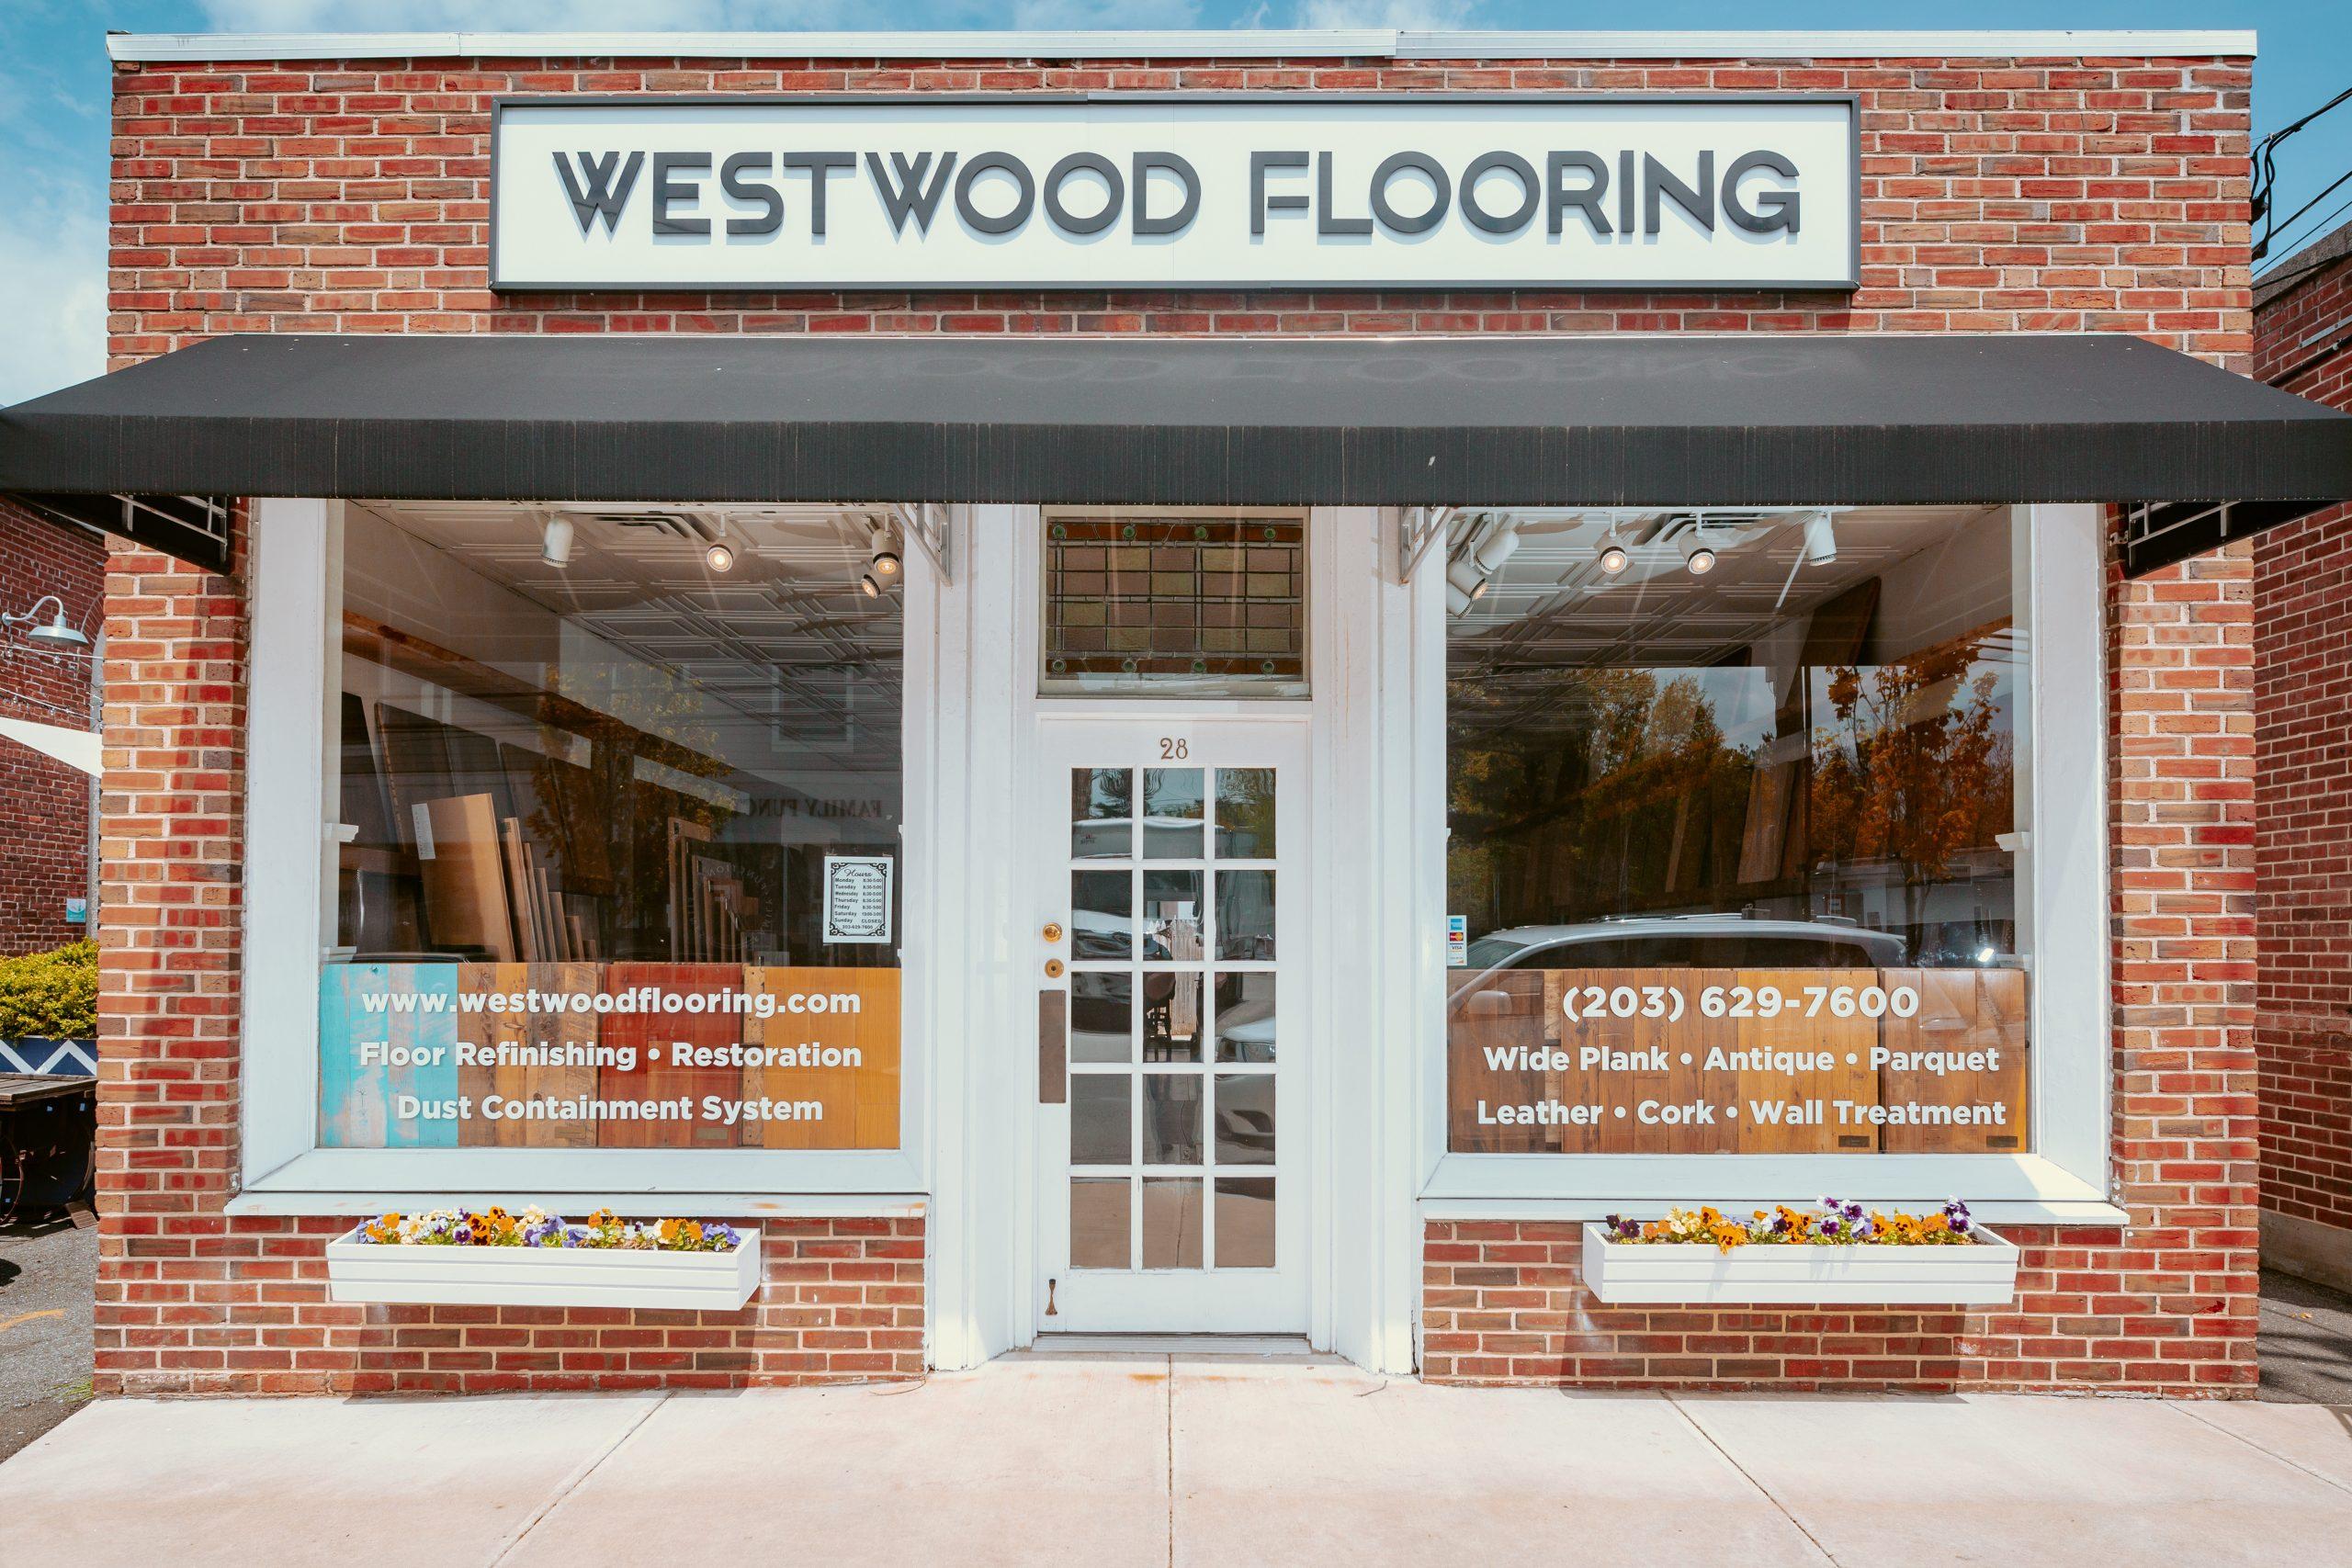 Westwood Flooring in Greenwich, CT